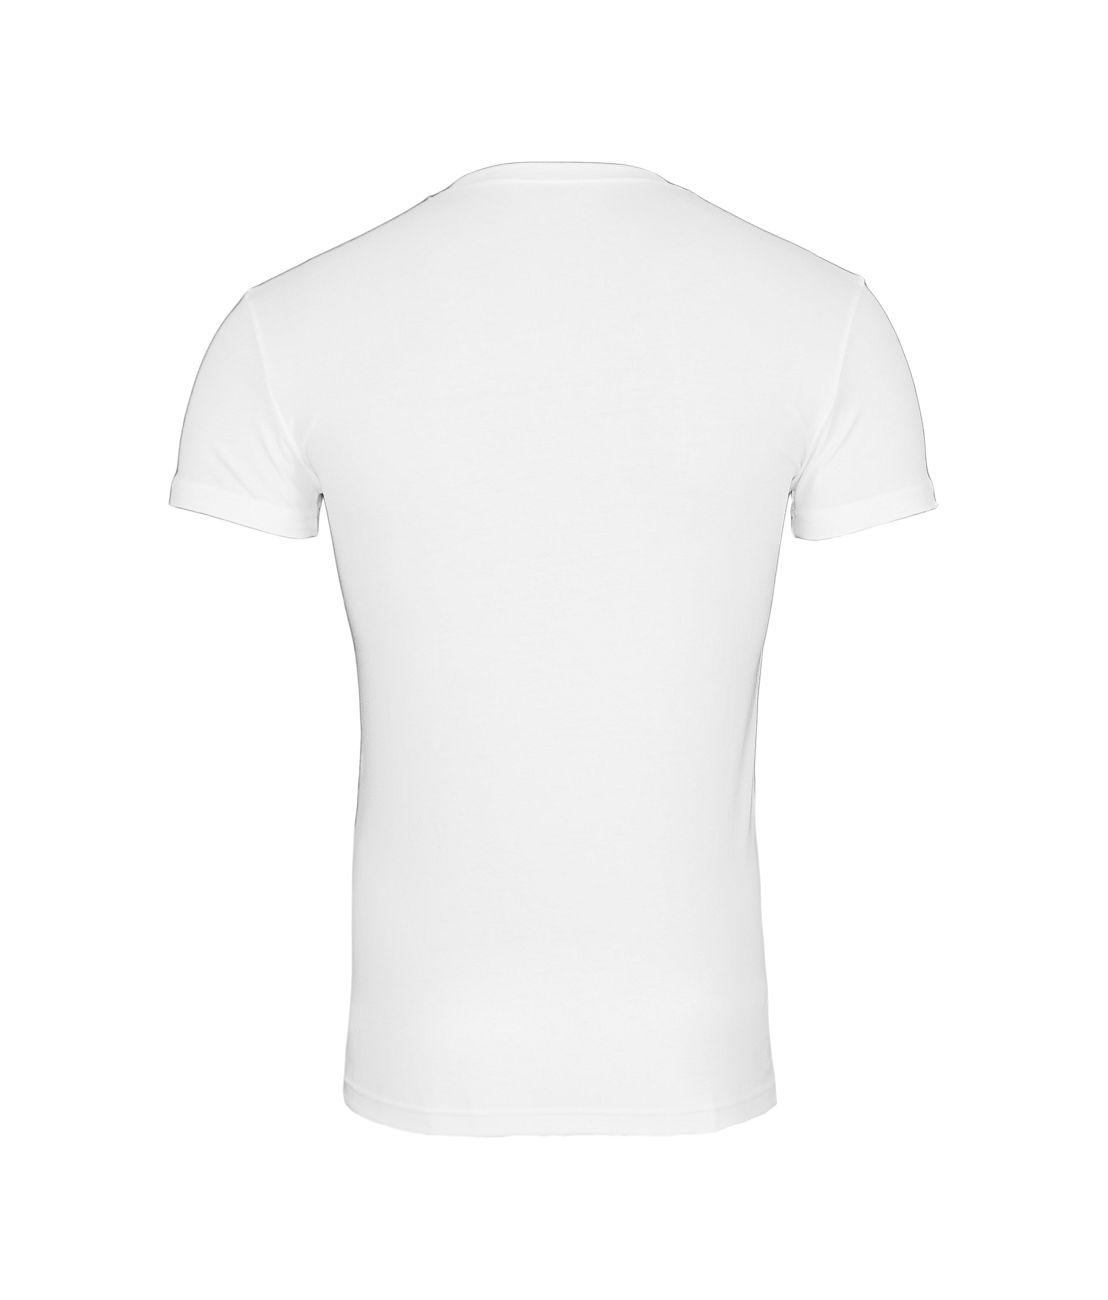 Emporio Armani T-Shirt V-Ausschnitt 110810 8P512 00010 BIANCO F18-EAT1